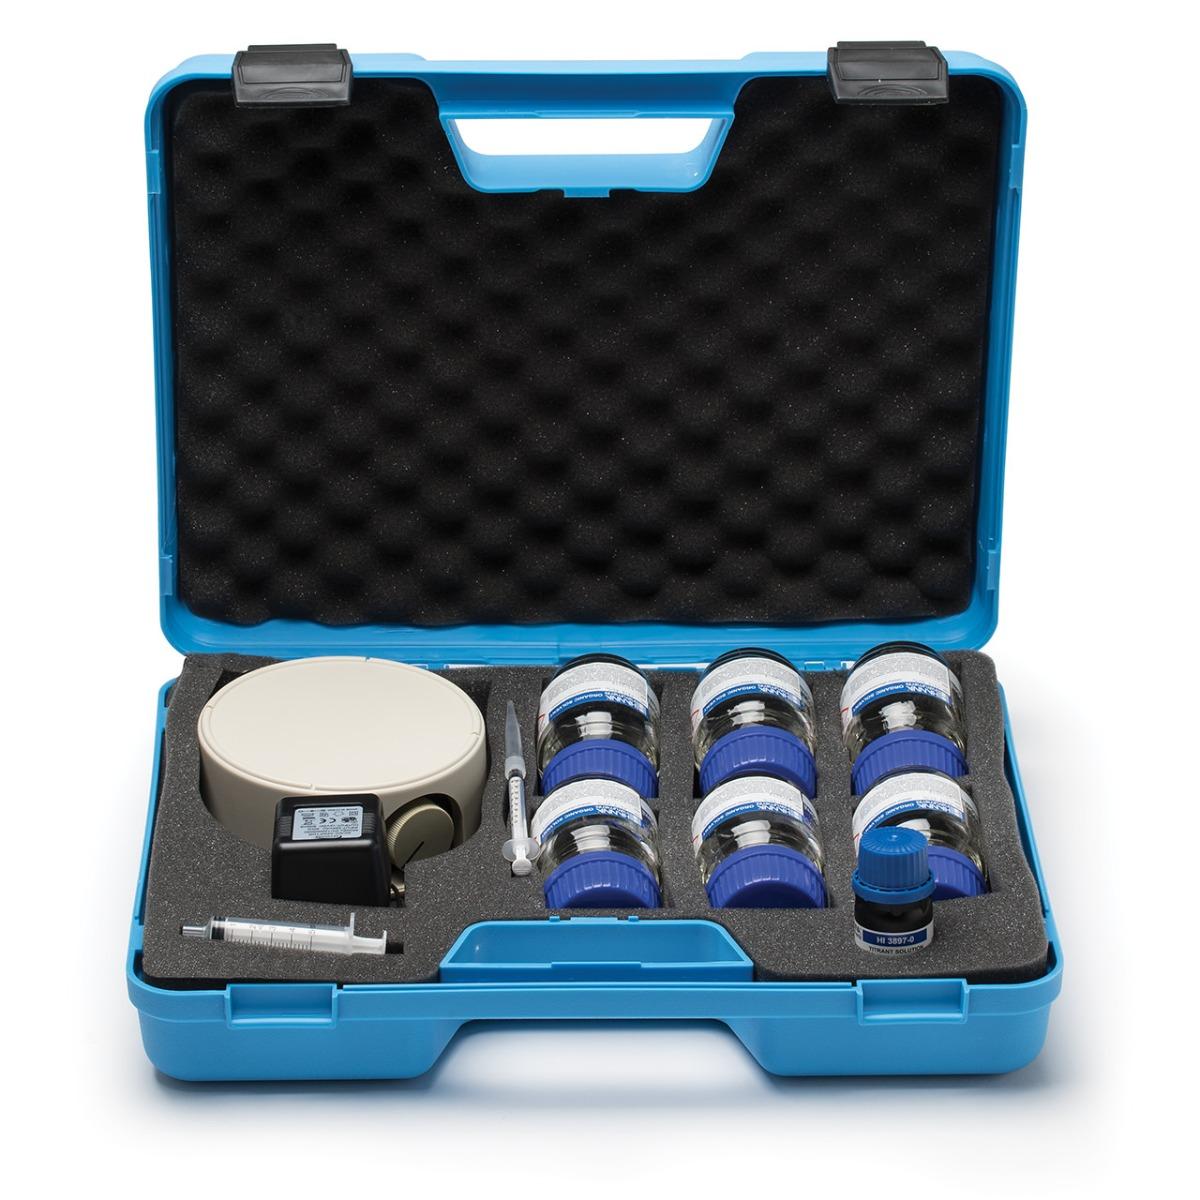 Olive Oil Acidity Test Kit - HI3897